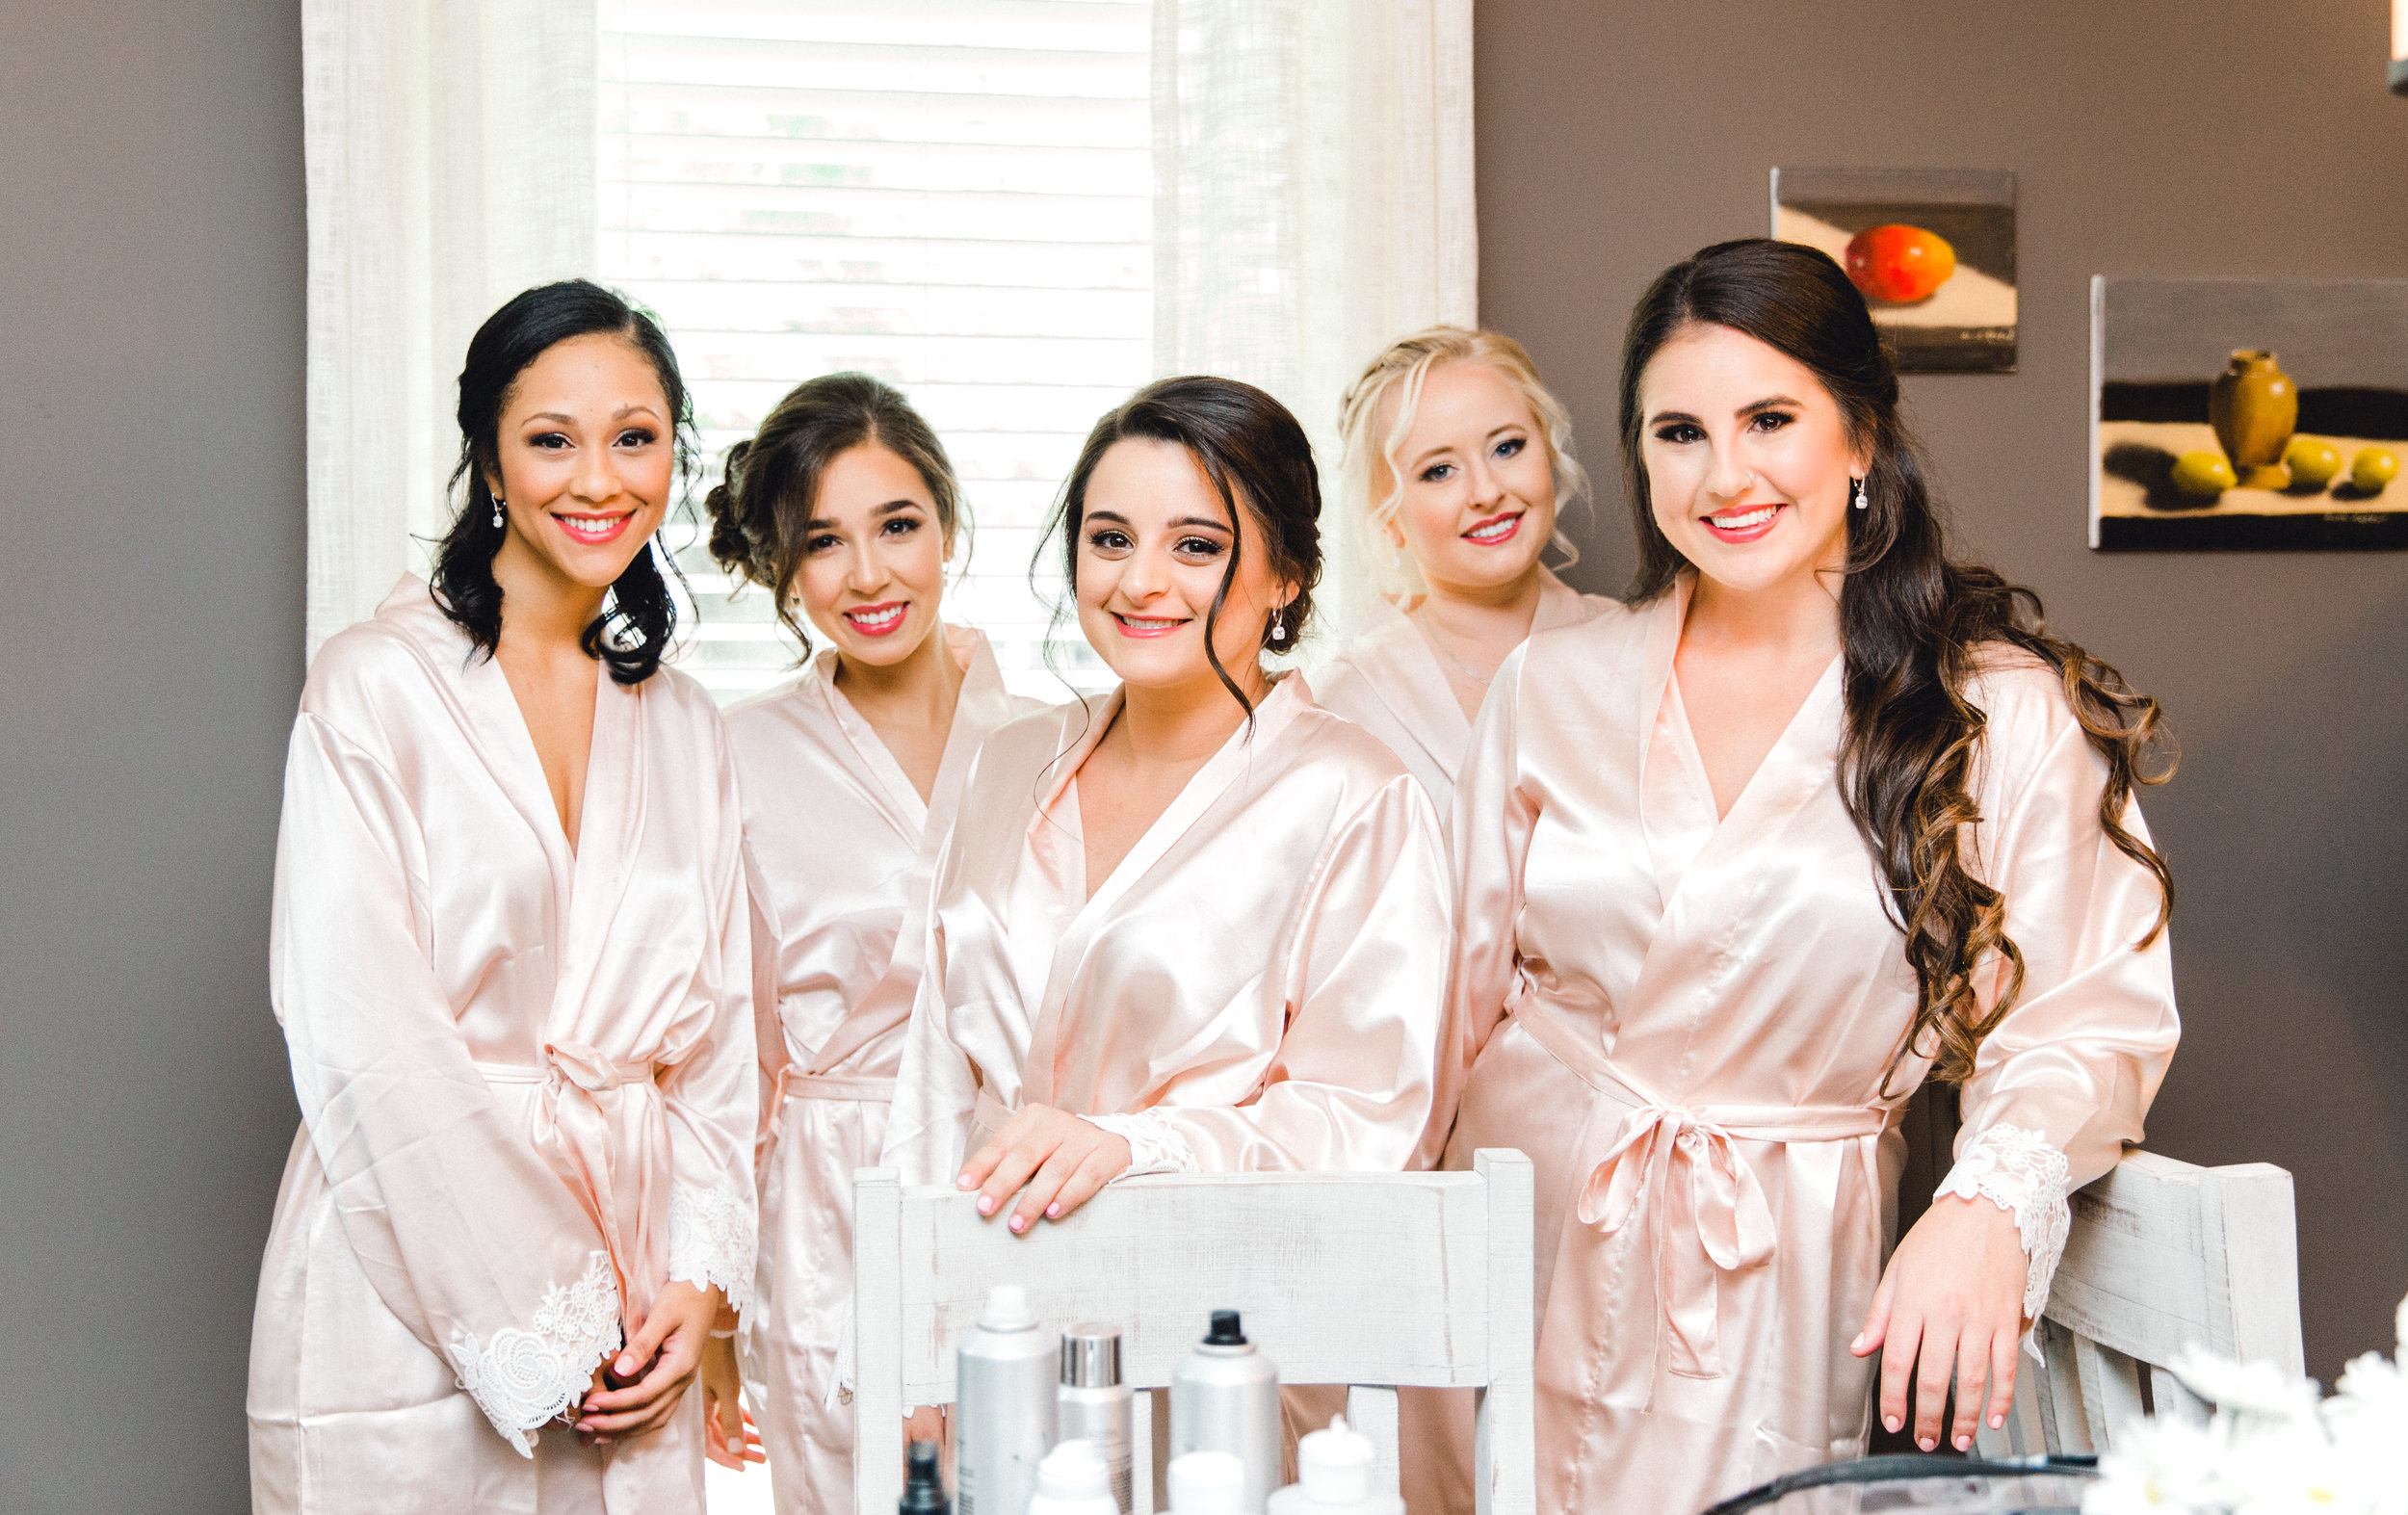 Paige-Mercer-Photography-Florida-Wedding-Photographer-Alyssa&Drew-7.jpg